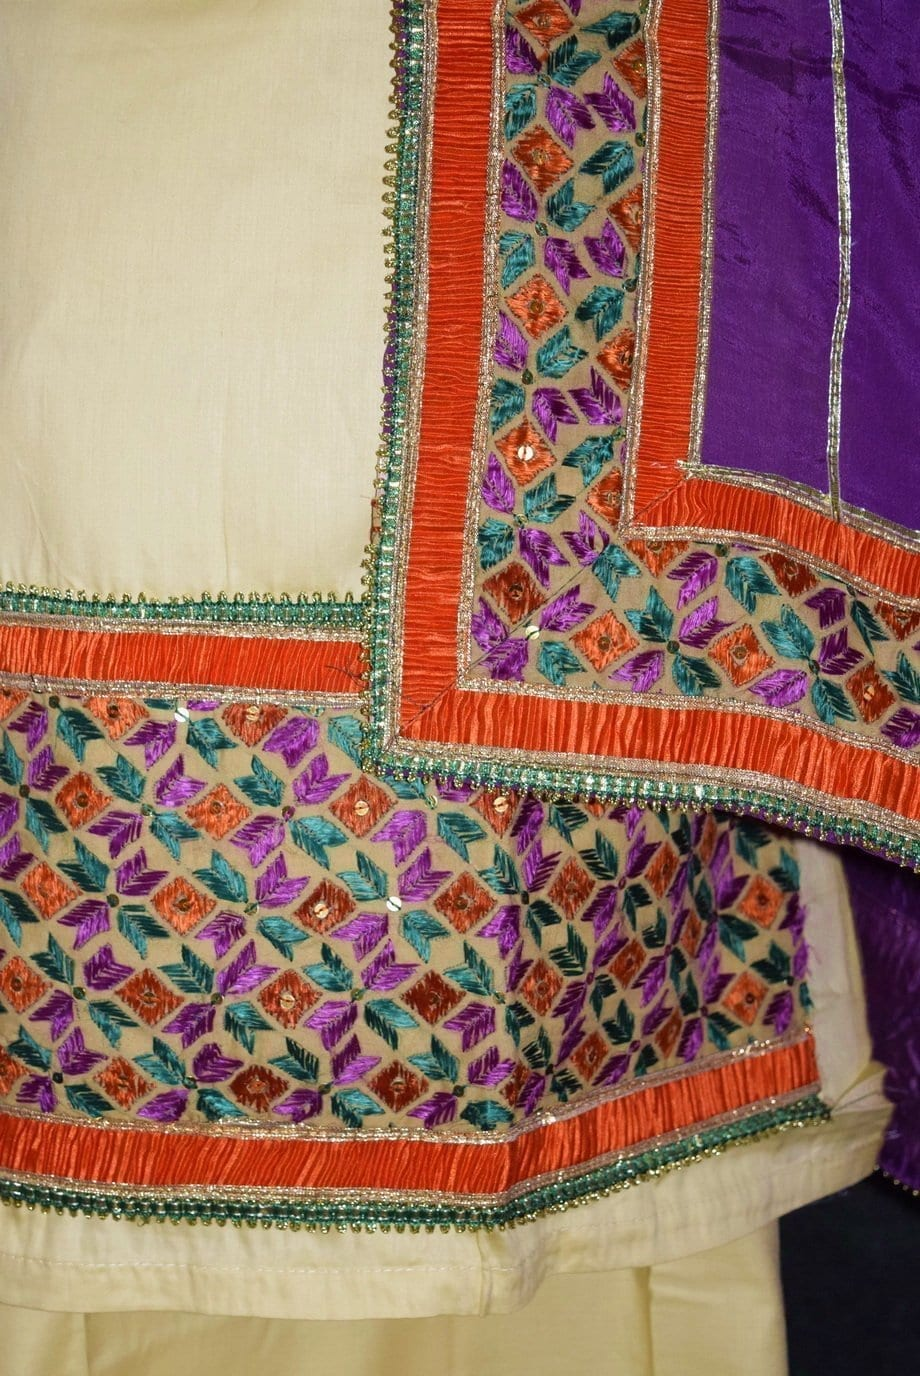 Glazed Cotton Hand Embroidered Salwar kameez suit CHINON DUPATTA set F0659 3